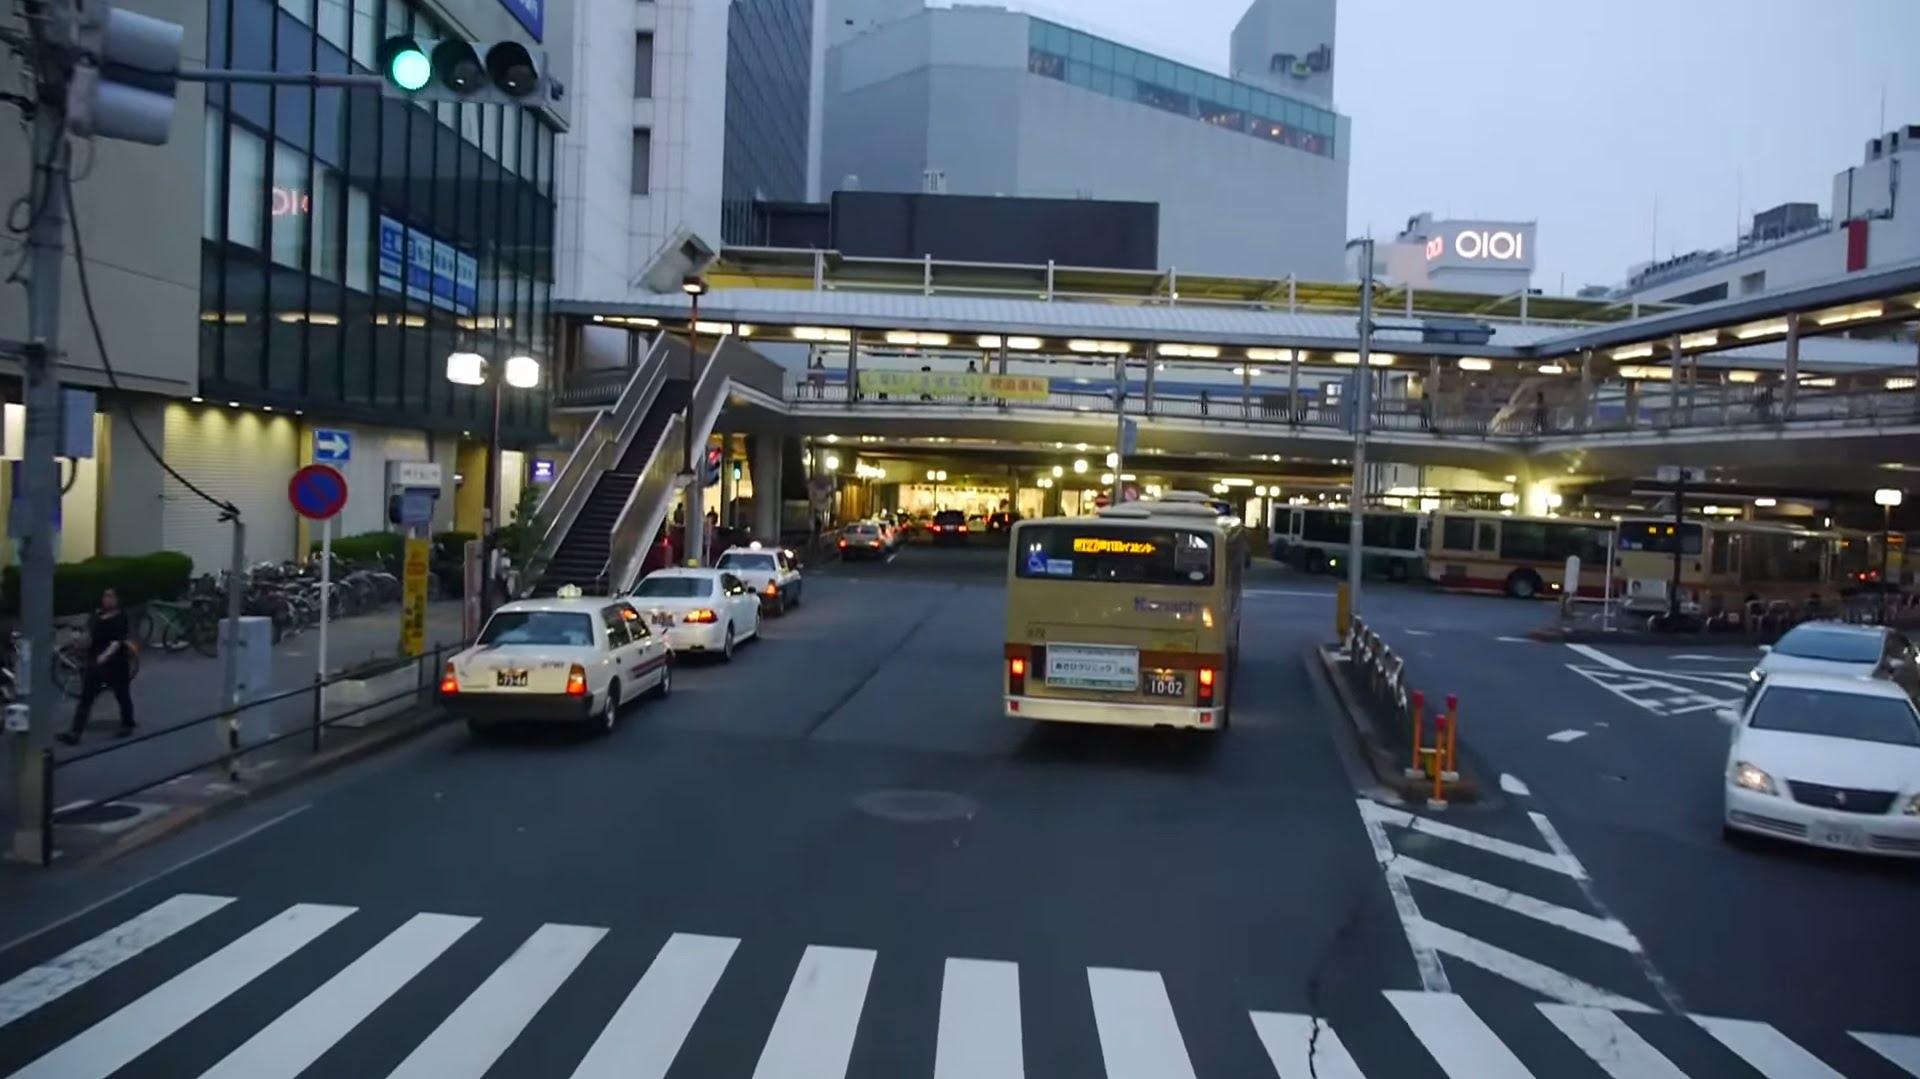 【60fps】西日本JRバス 横浜昼特急大阪2号 前面展望 足柄サービスエリア~町田バスセンター